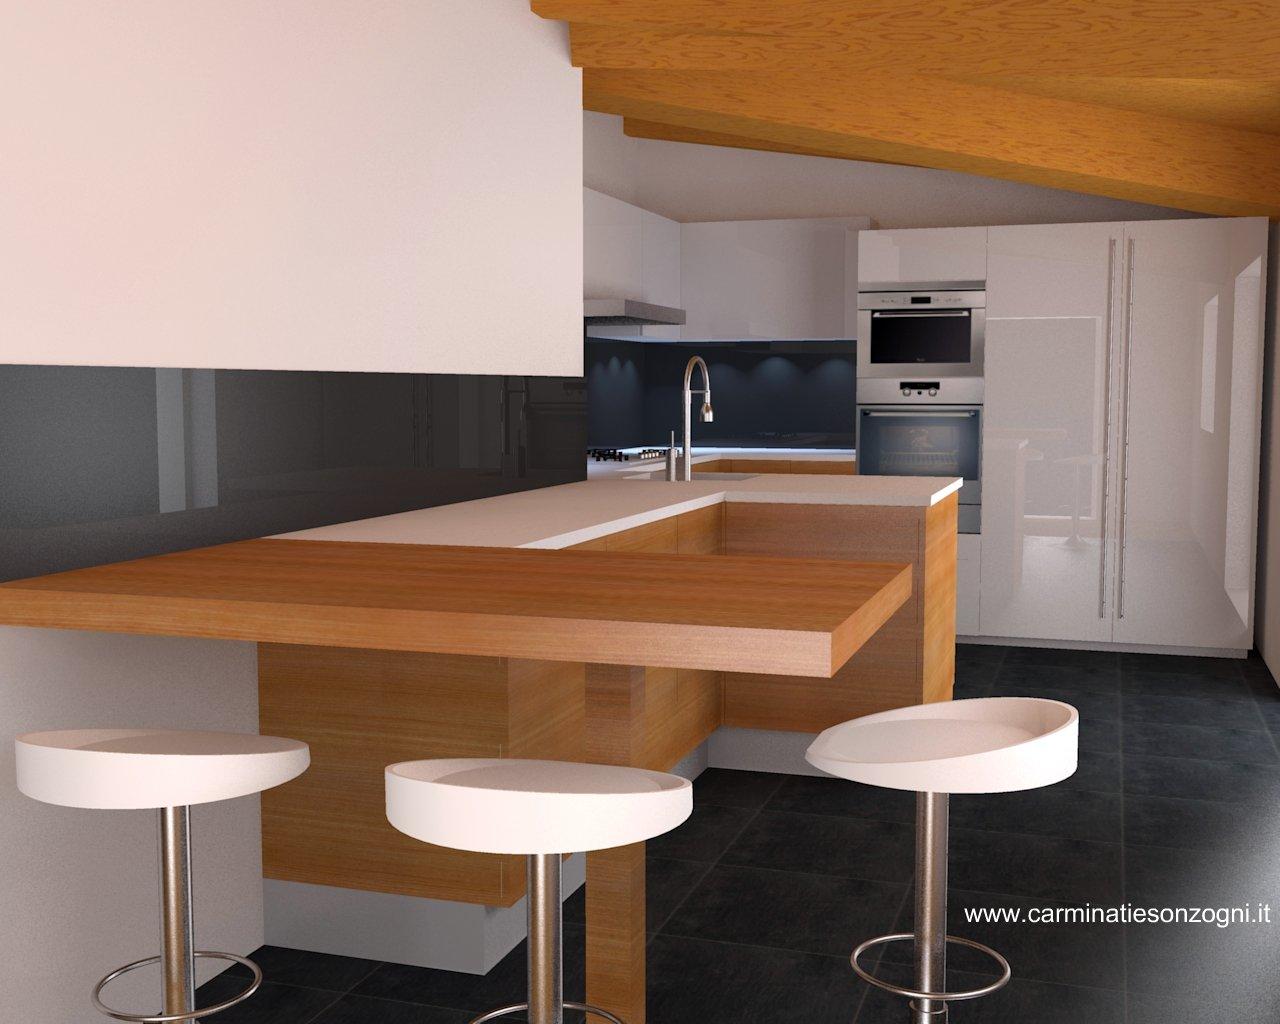 Cucine Per Mansarde. Cucine Per Mansarde In Ciliegio With Cucine Per ...